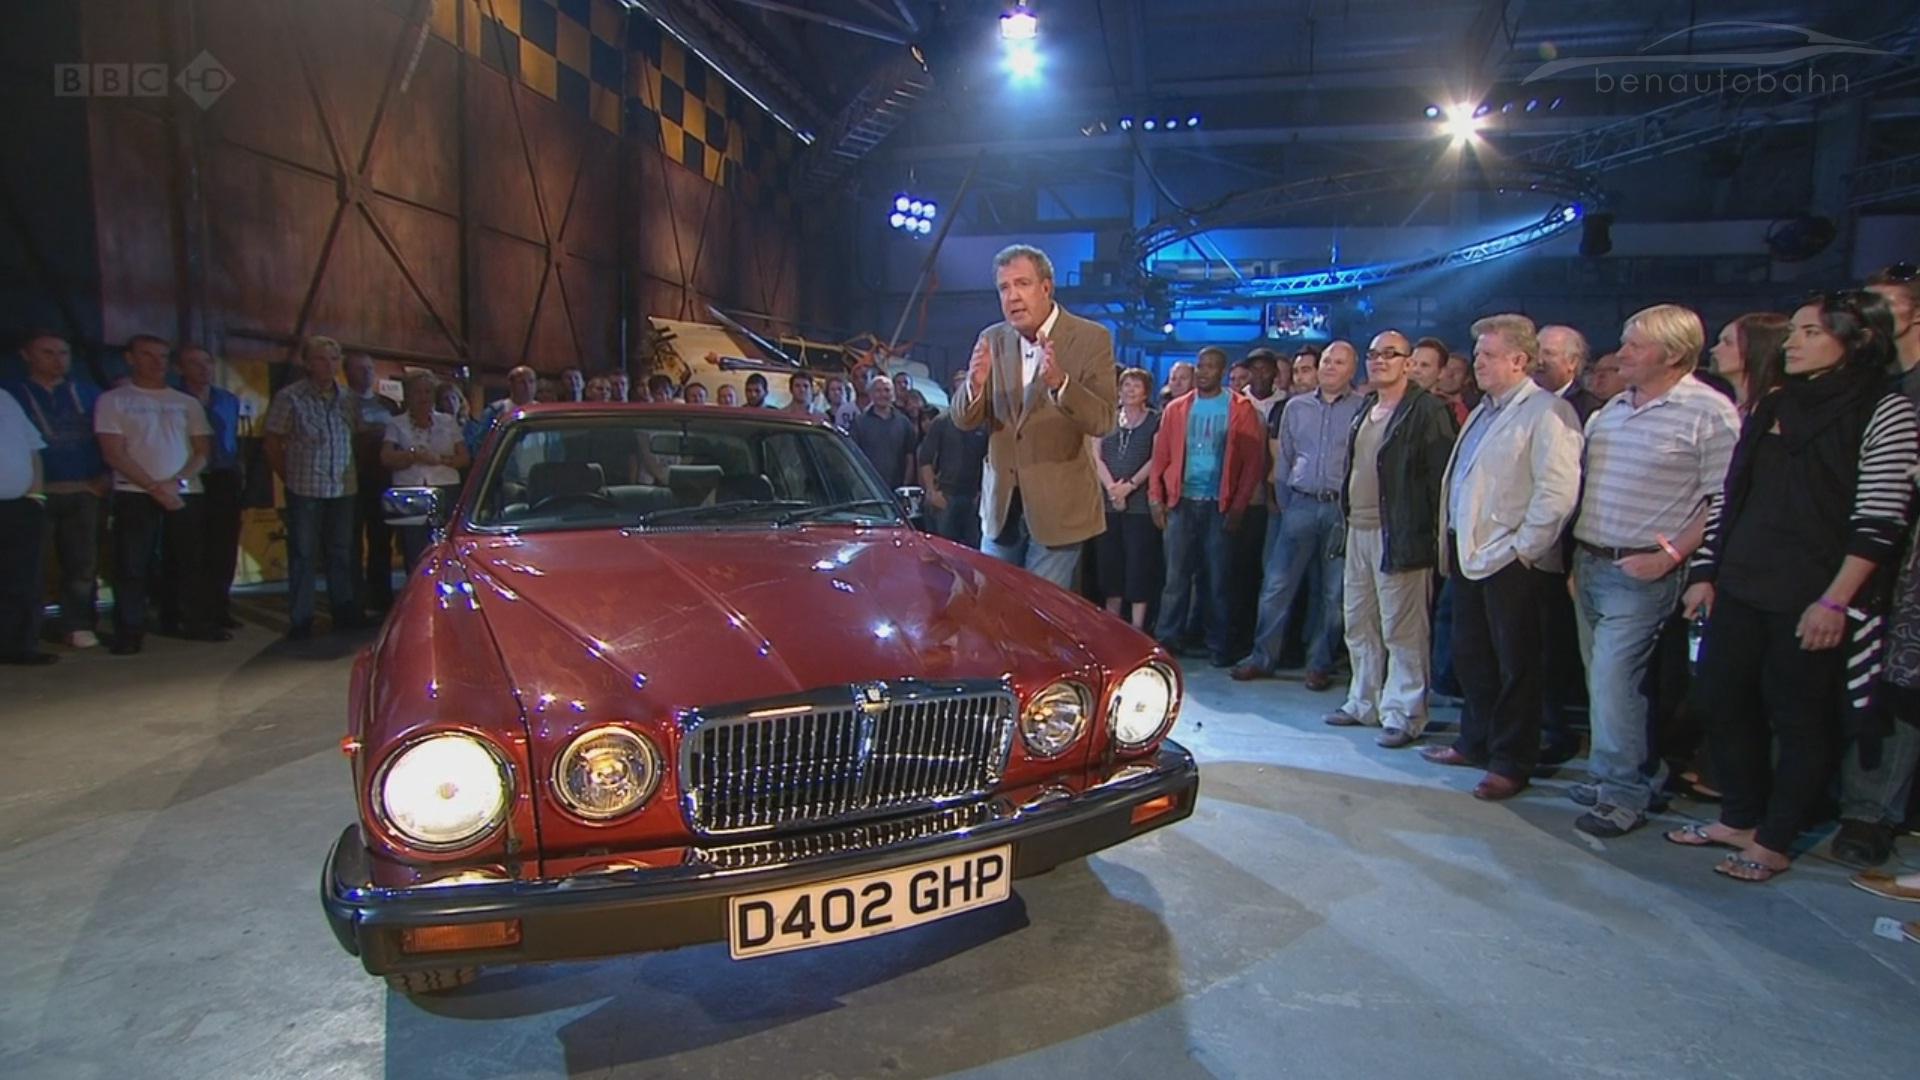 Top Gear season 17 episode 4 review! – BenAutobahn